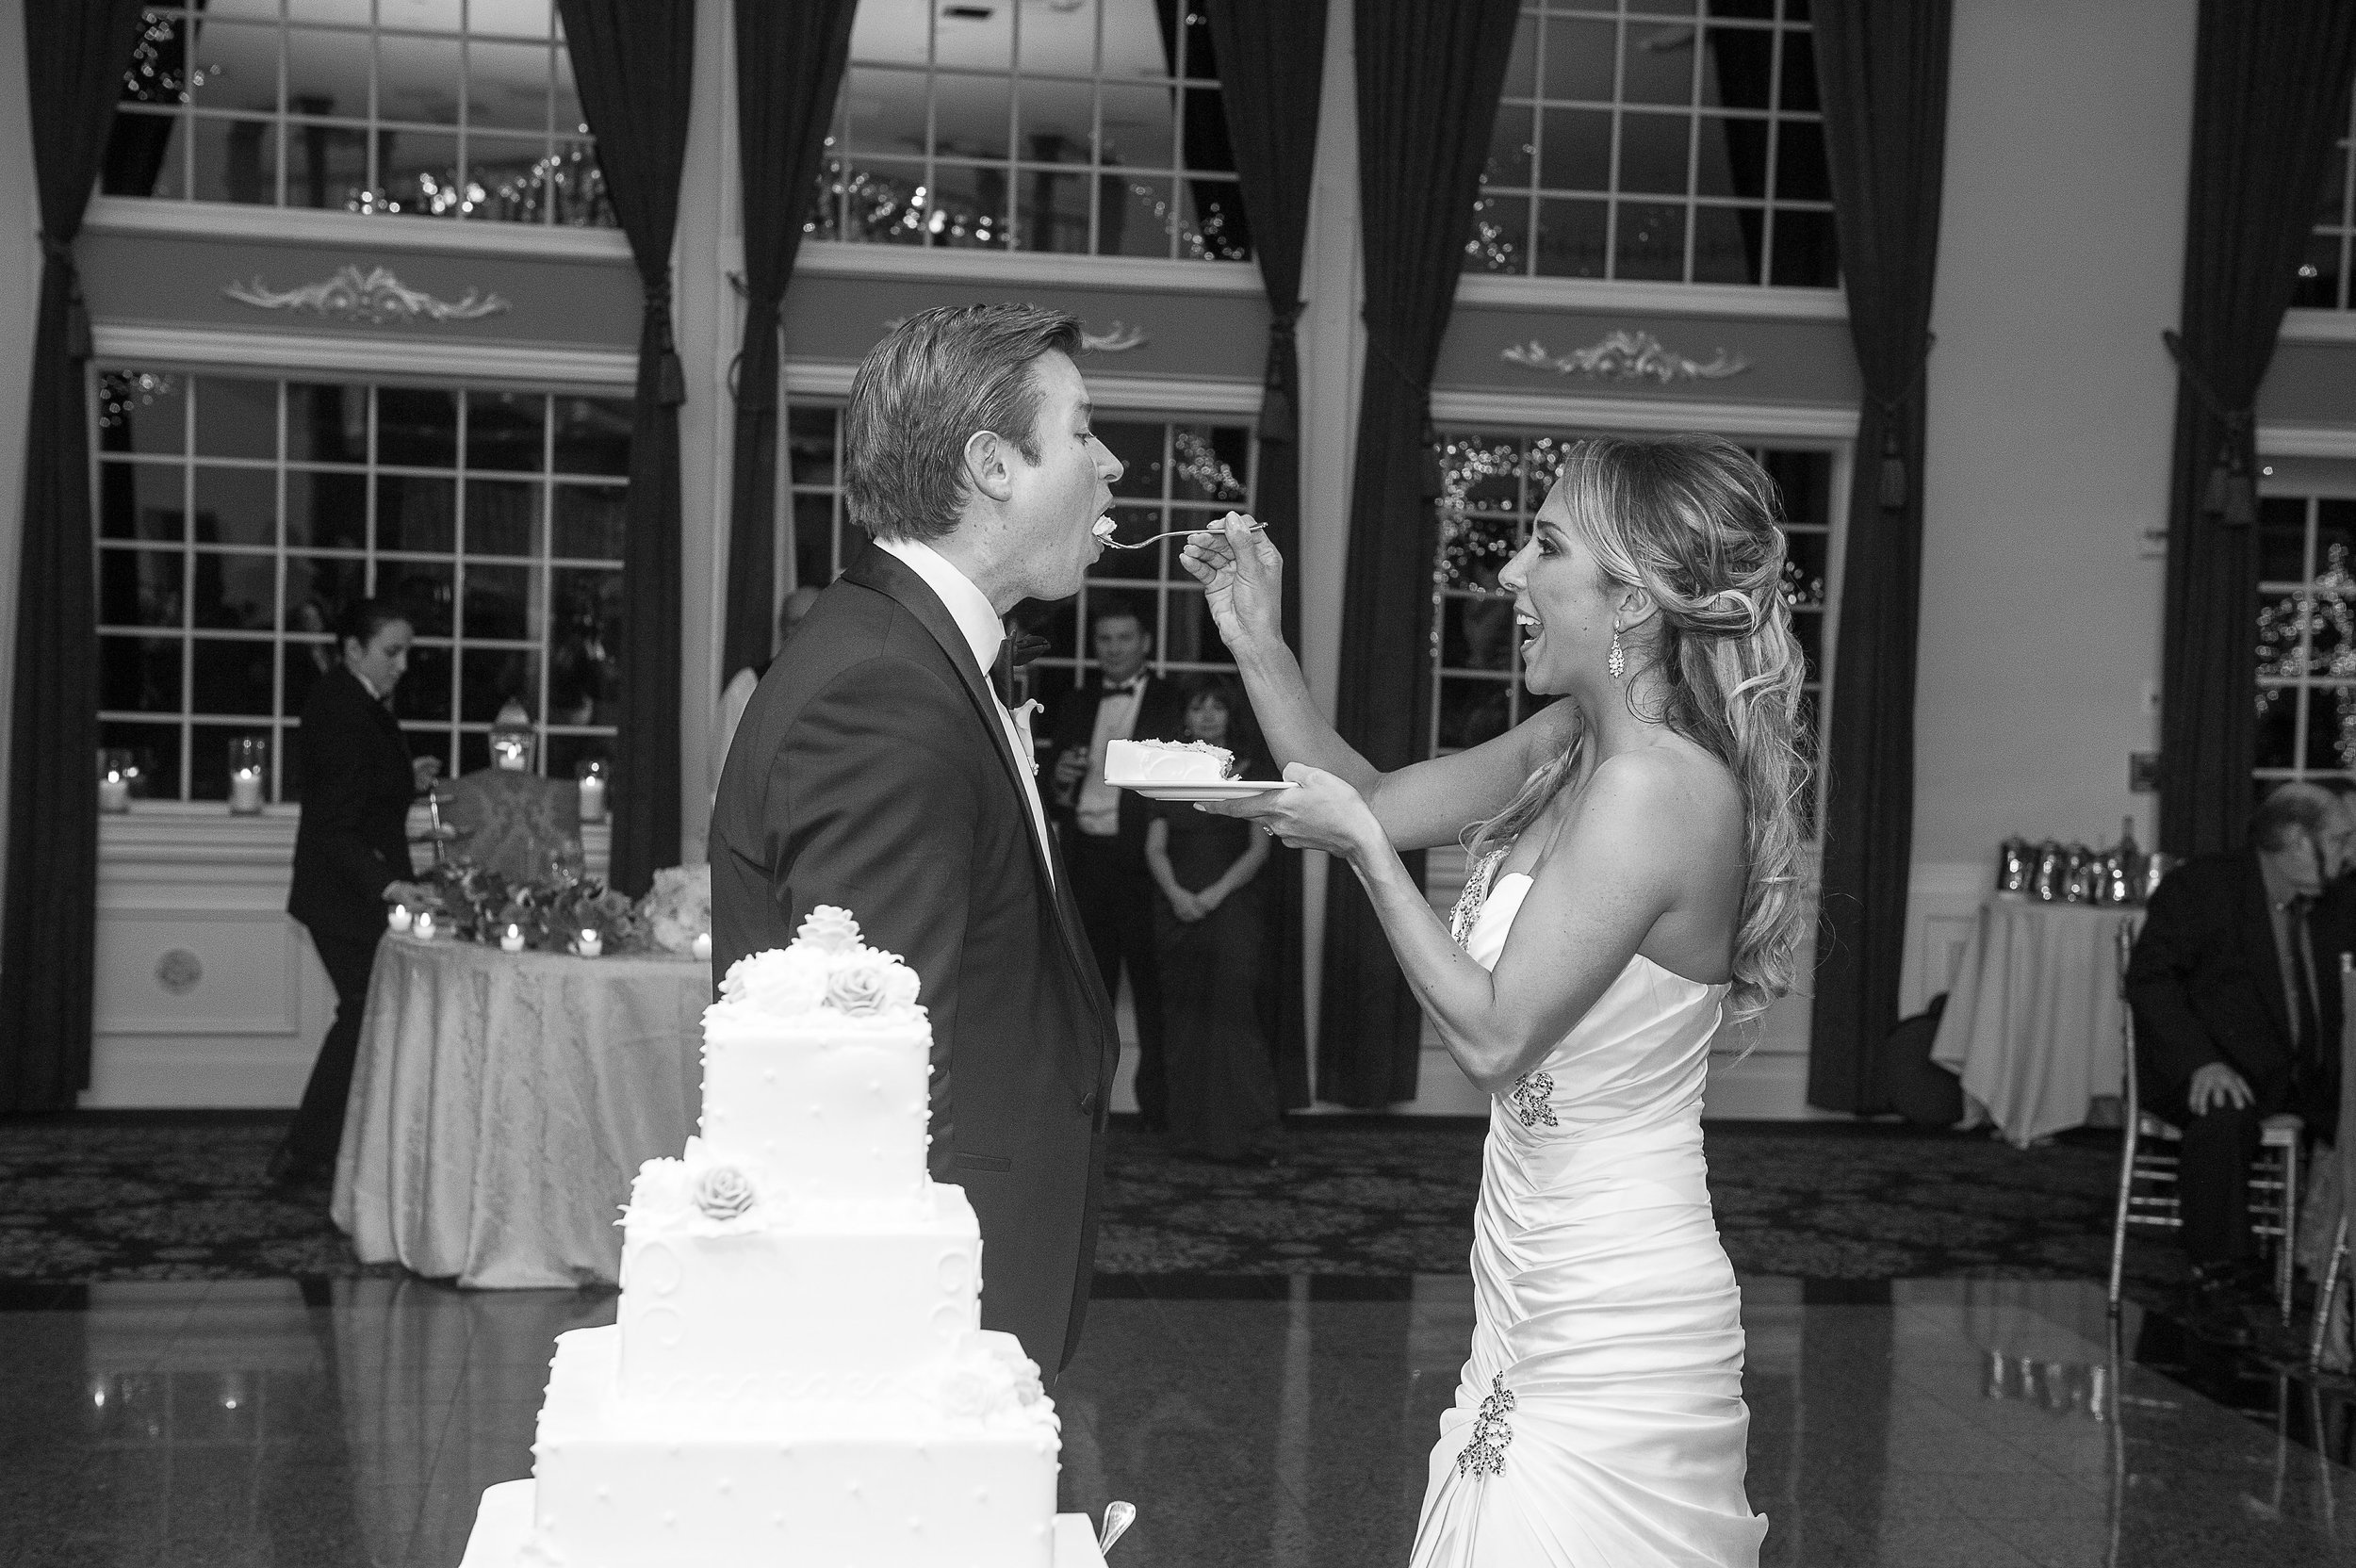 Ceci_New_York_Custom_Invitation_ New_Jersey_Wedding_Luxury_Personalized_Ceci_Style_Bride_Foil_Stamping127.JPG